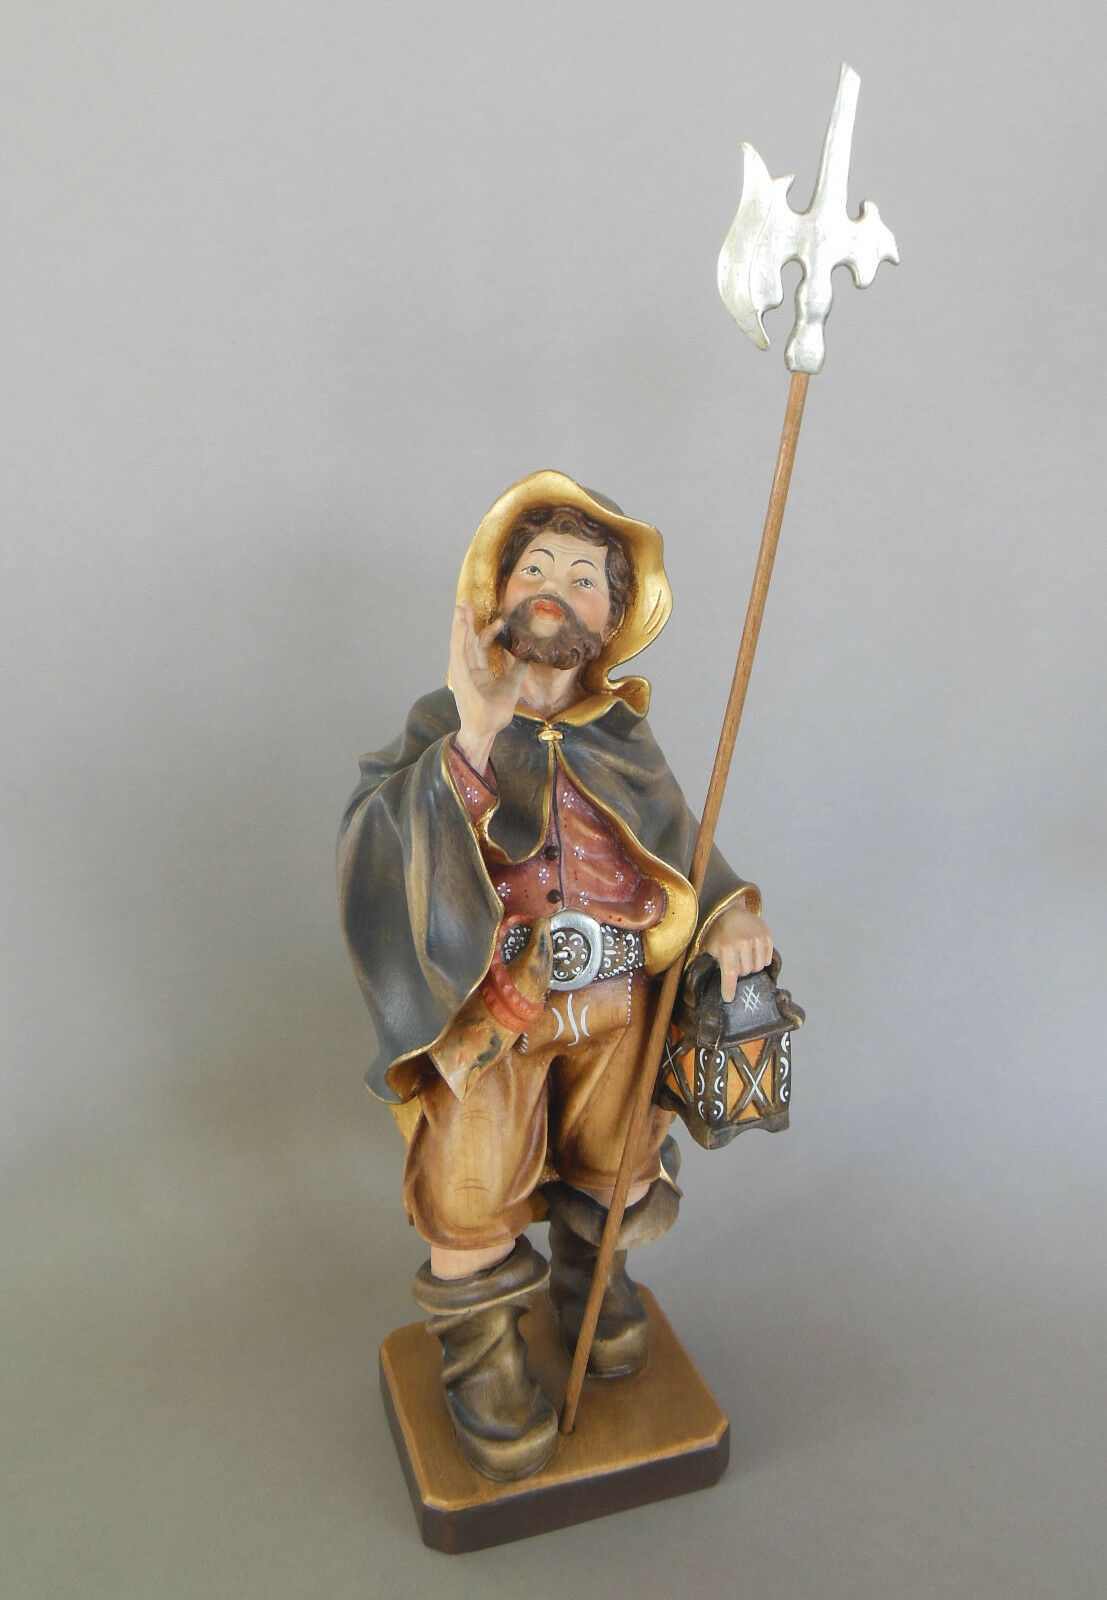 Nachtwächter ca. 30 cm hoch (Höhe Figur), Holz geschnitzt bemalt Wächter Nr. 1